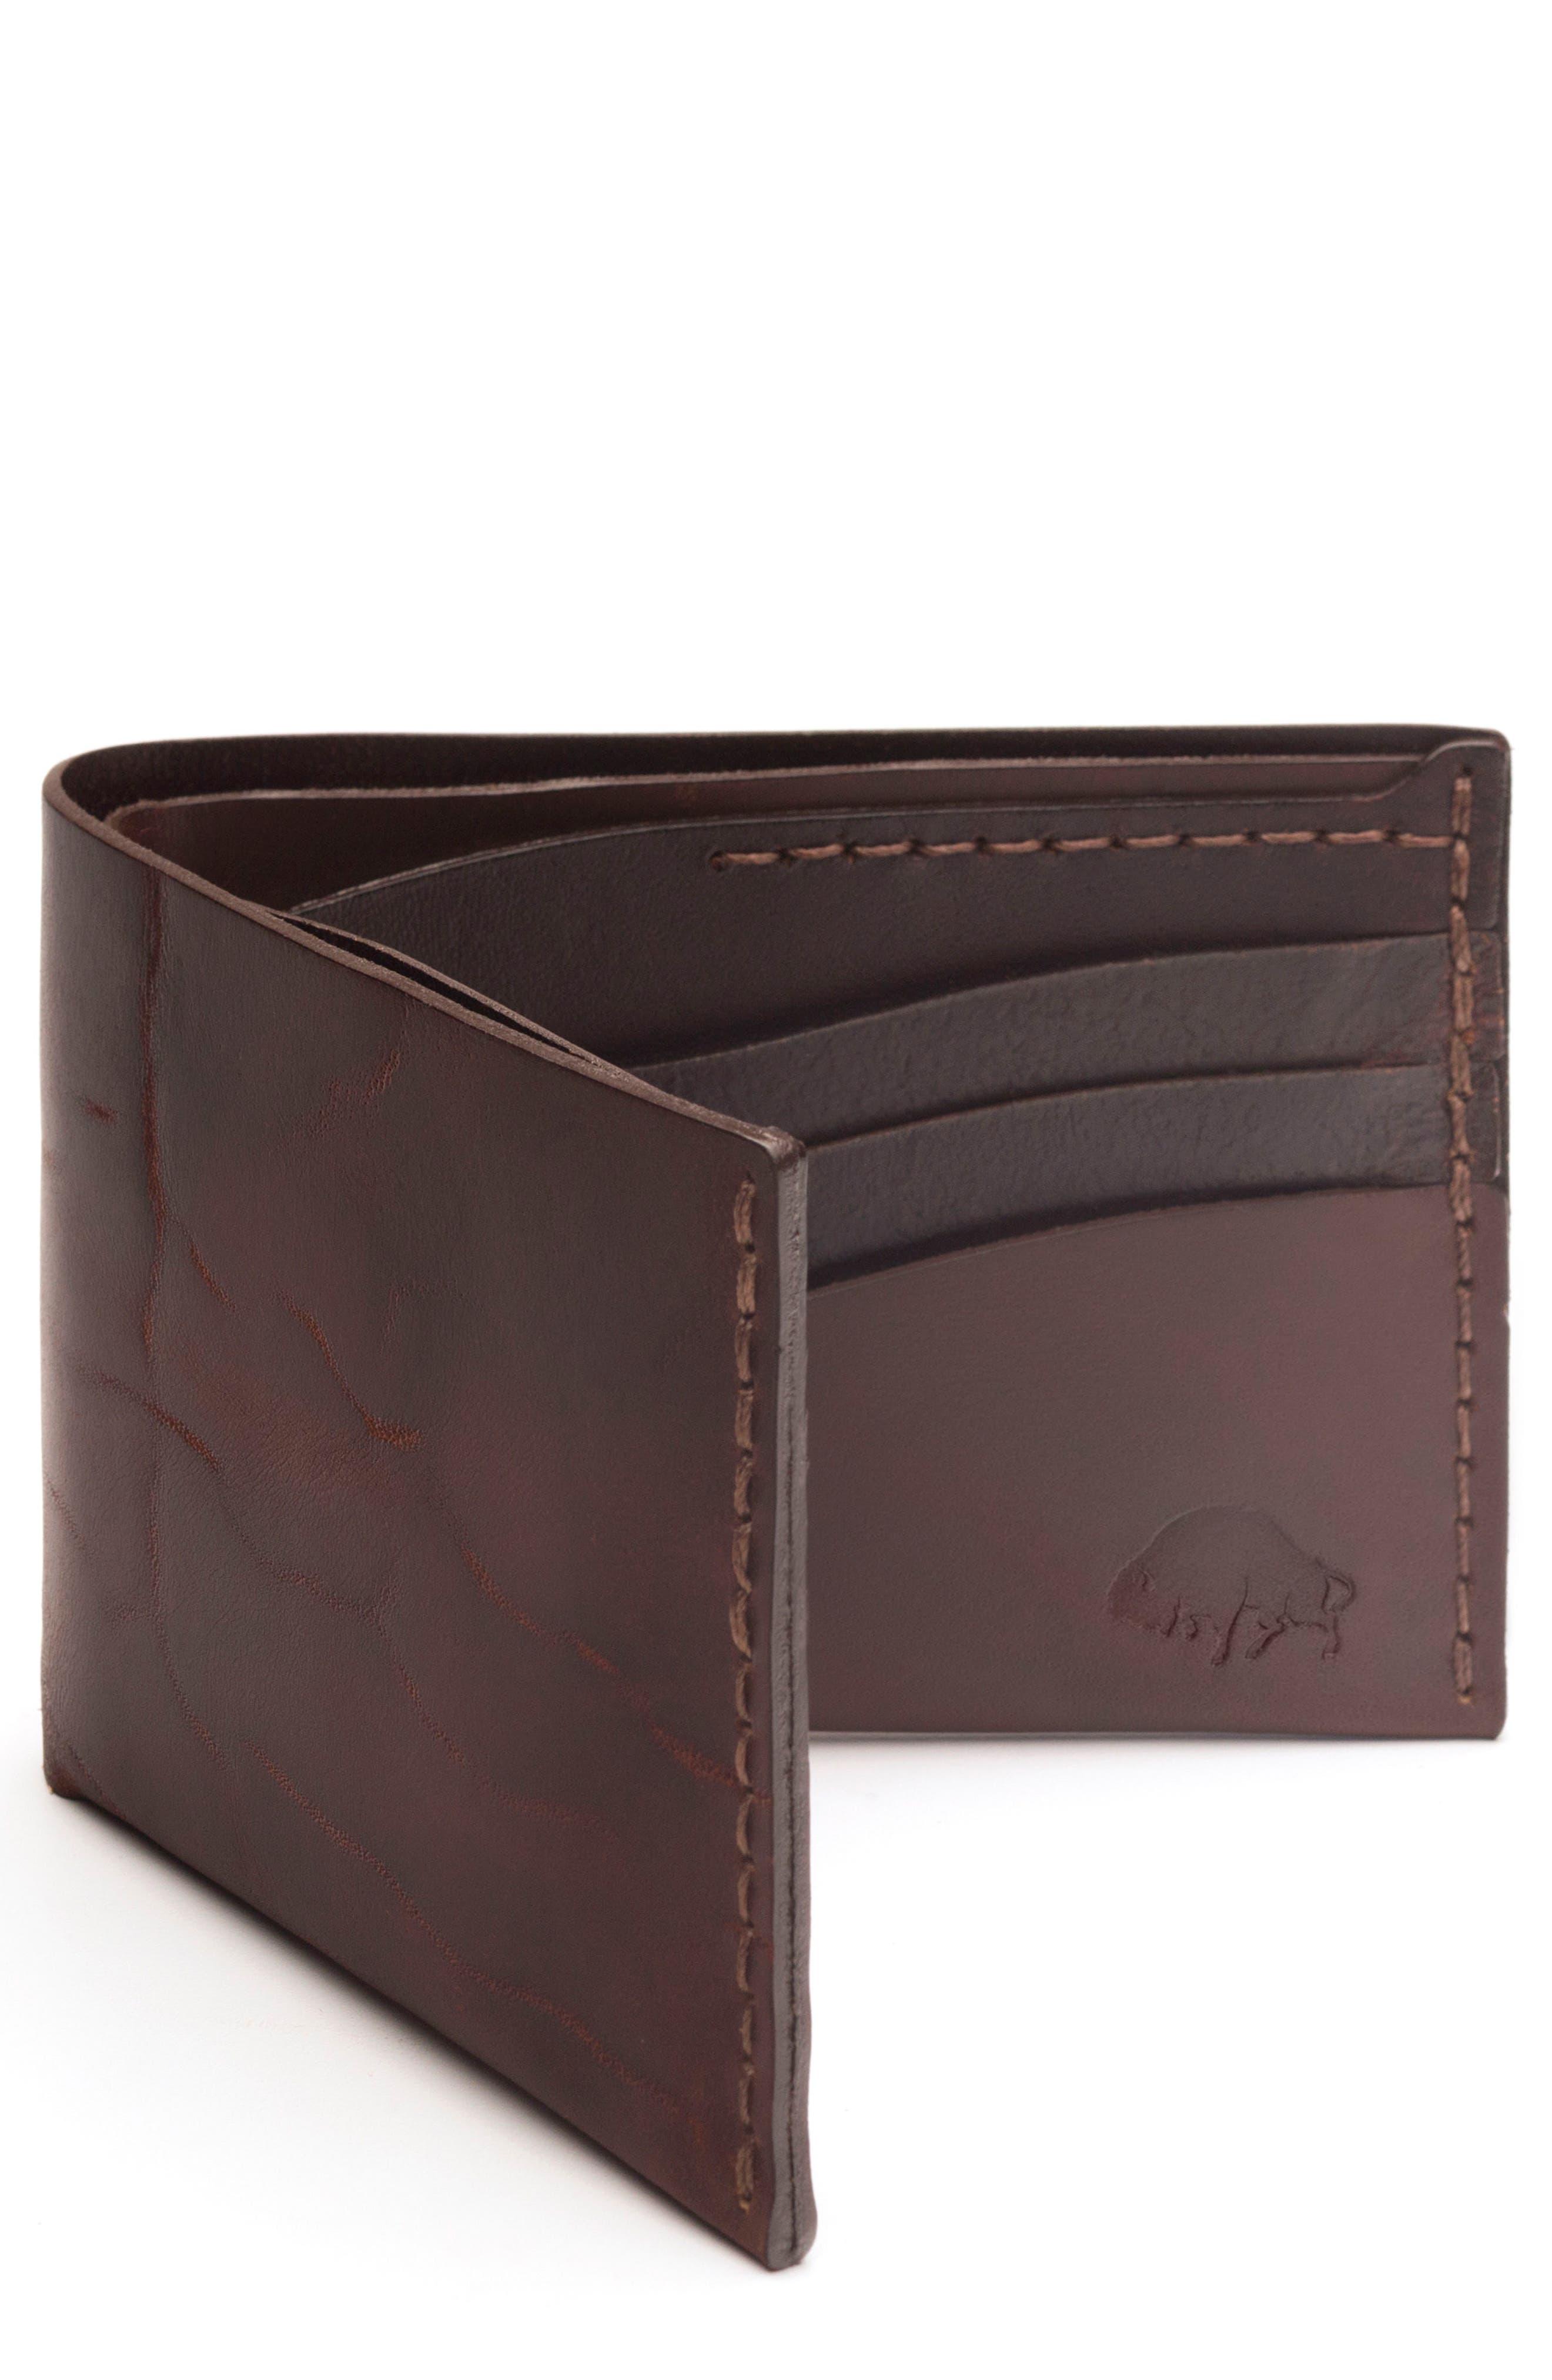 Ezra Arthur No. 8 Leather Wallet